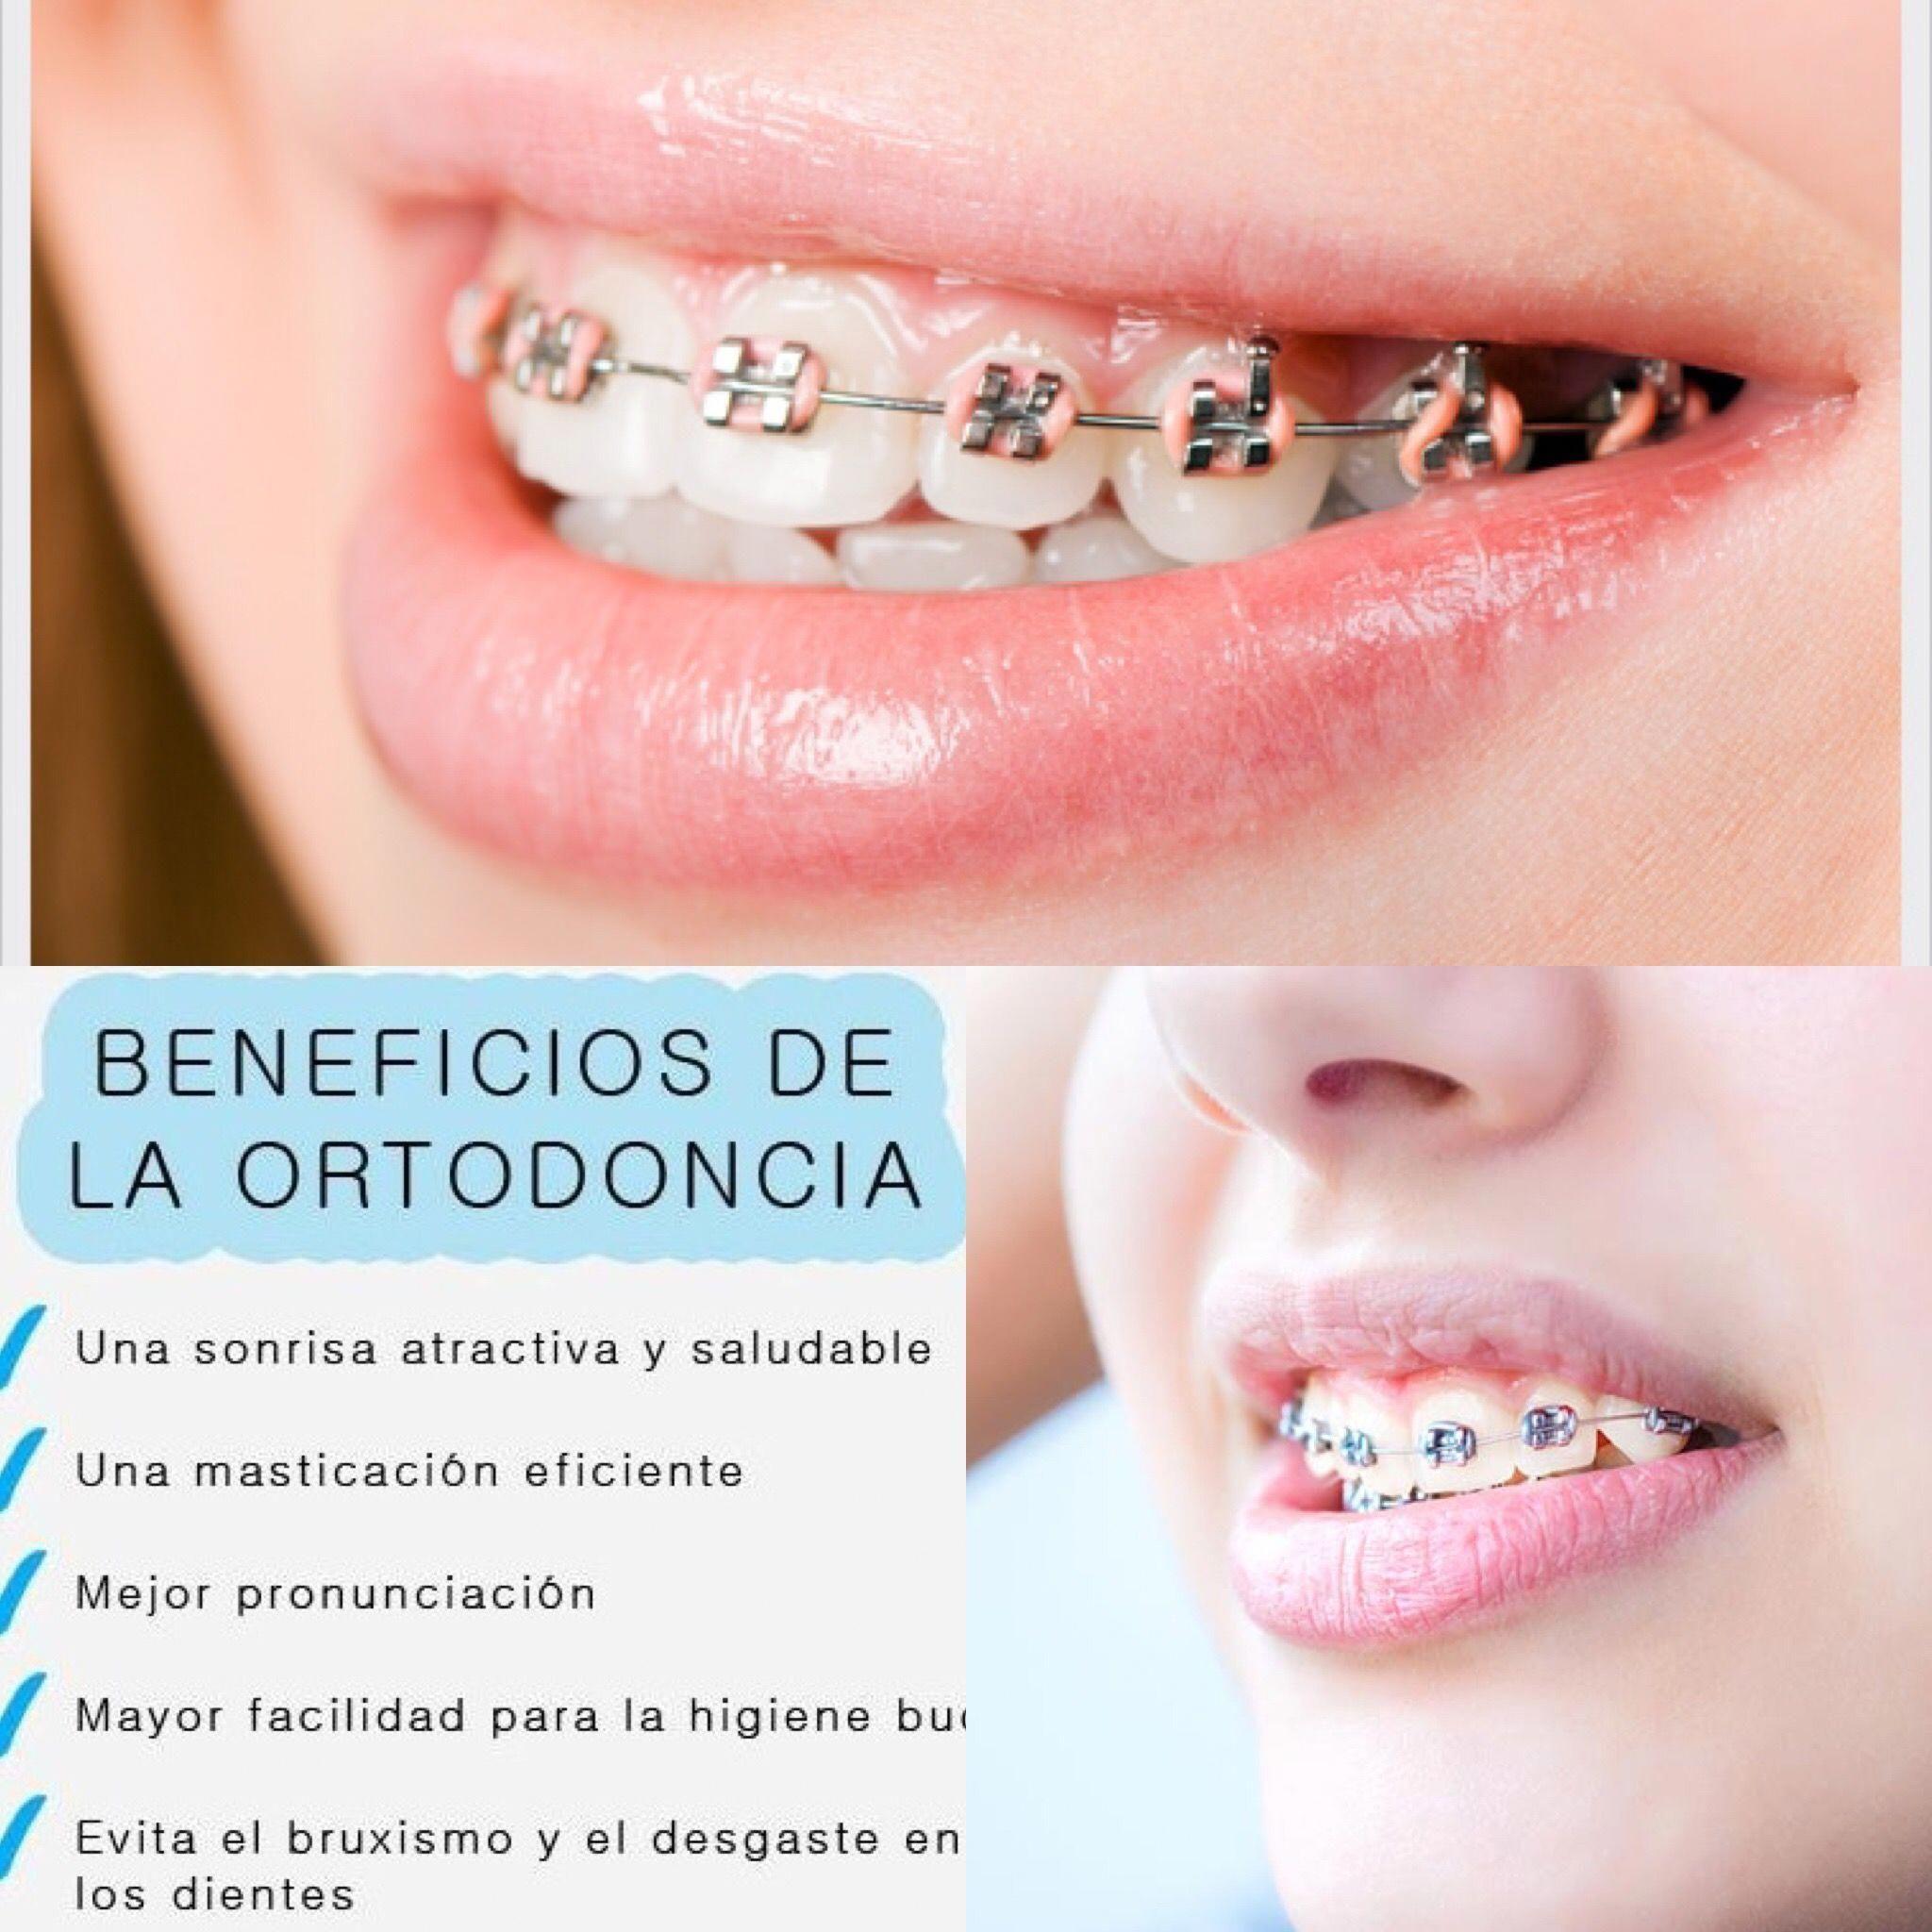 Stupendous Dental Implants Images oralhealthcaretips